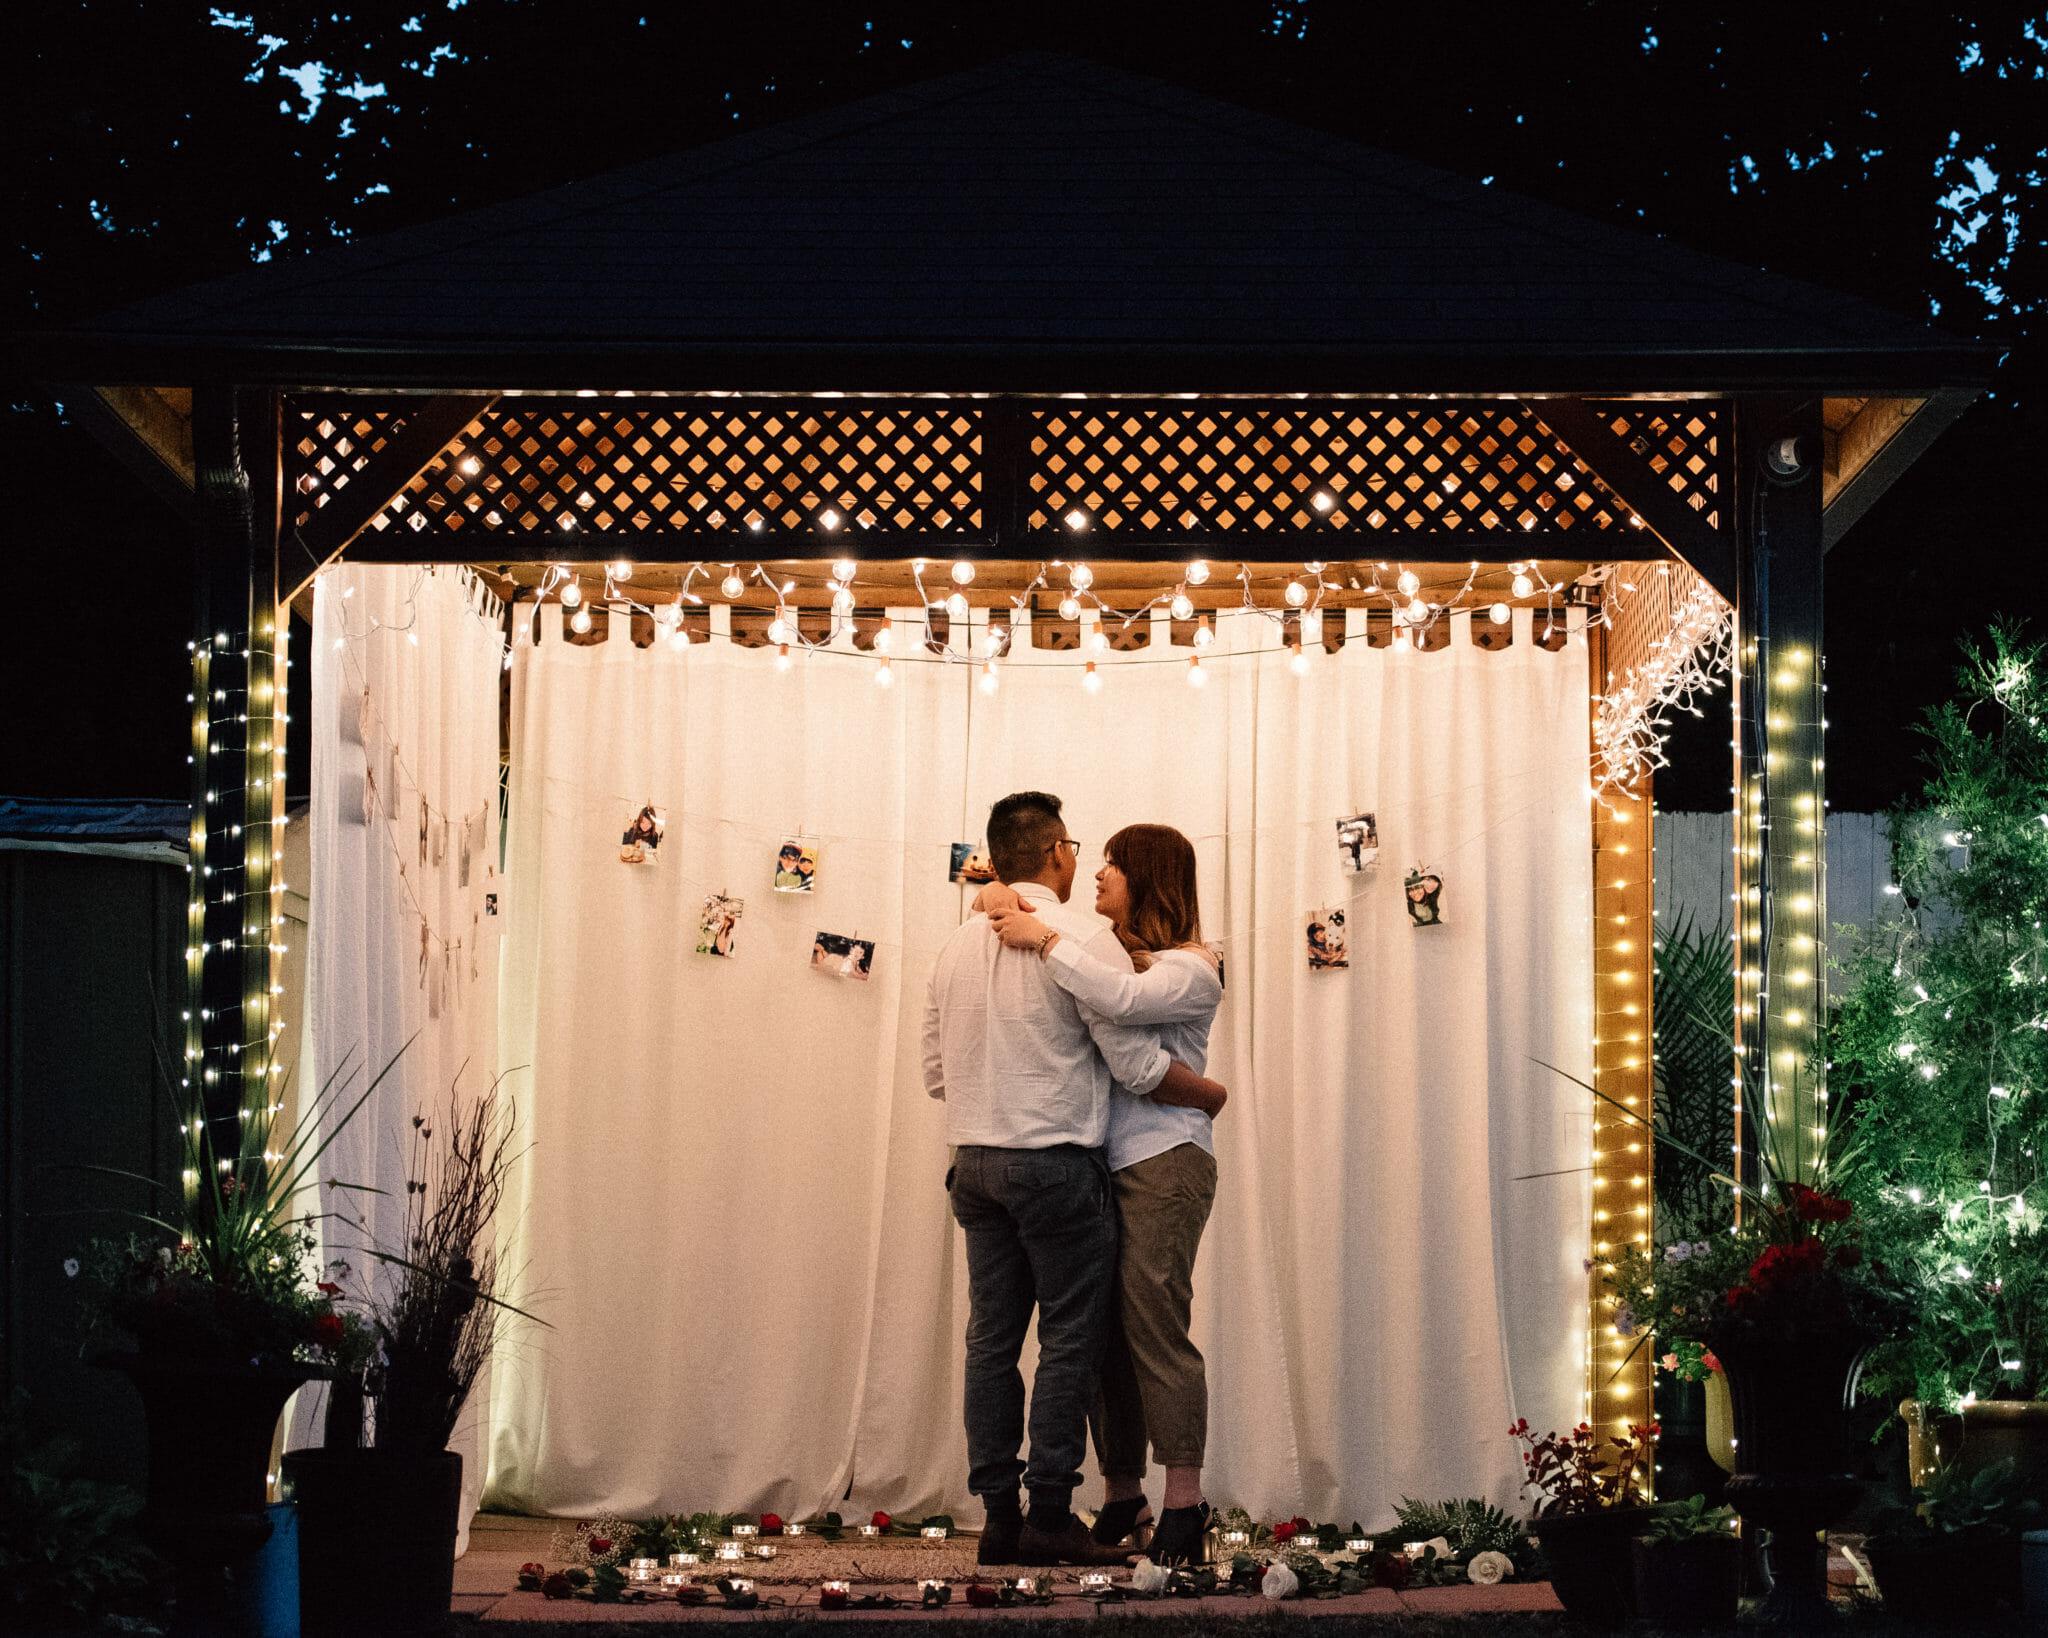 romantic backyard marriage proposal ideas